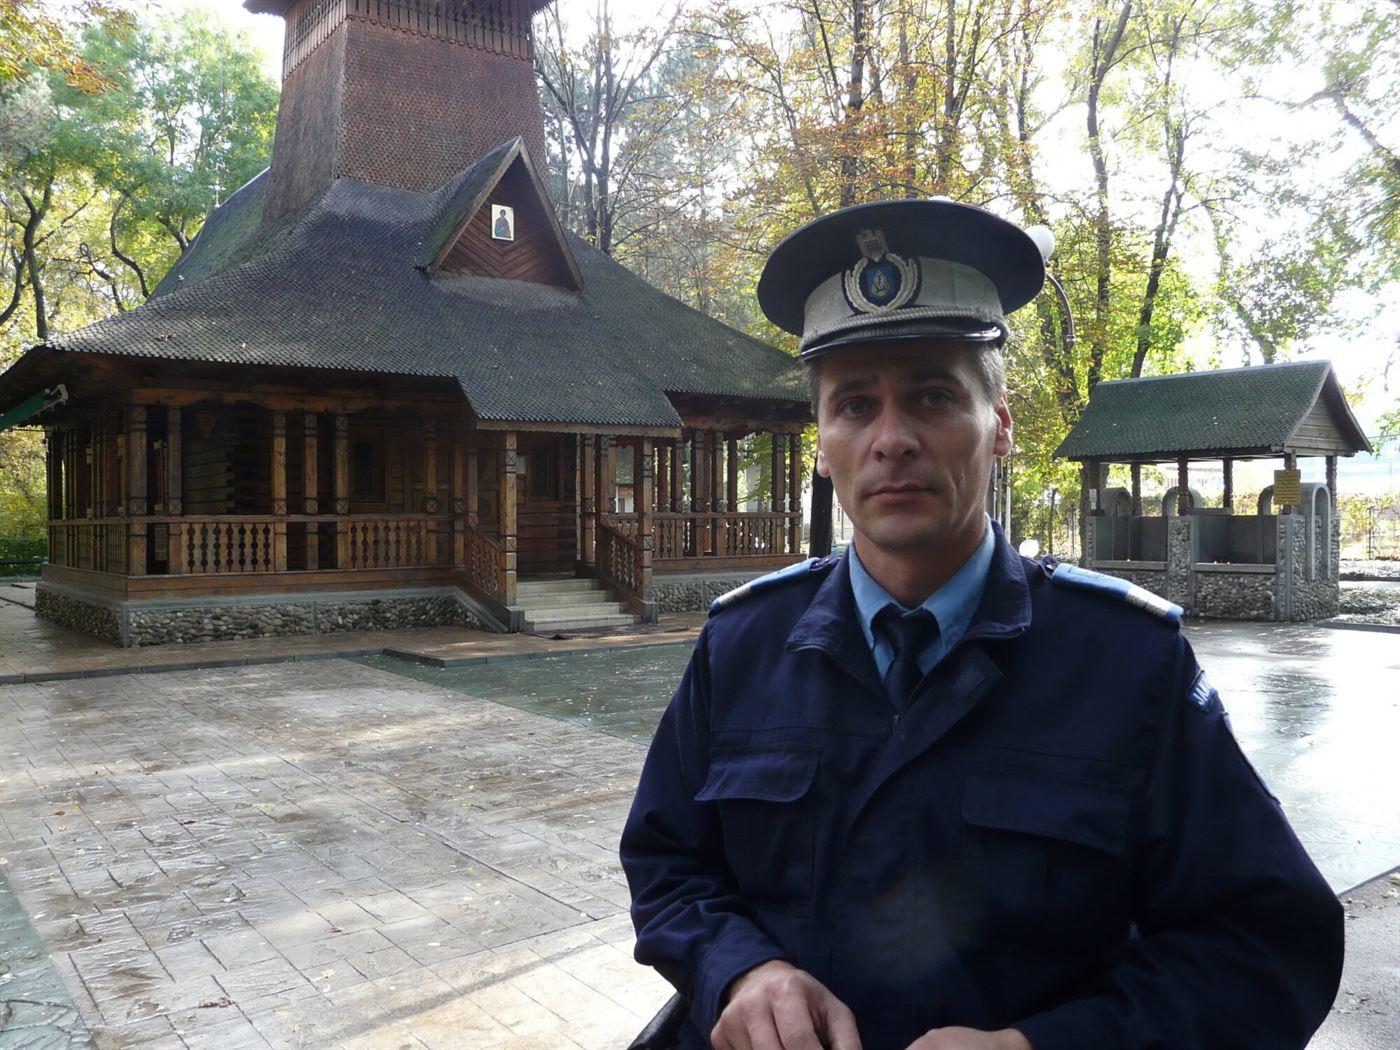 Constantin Iulian, jandarmul care prinde infractori si in timpul liber